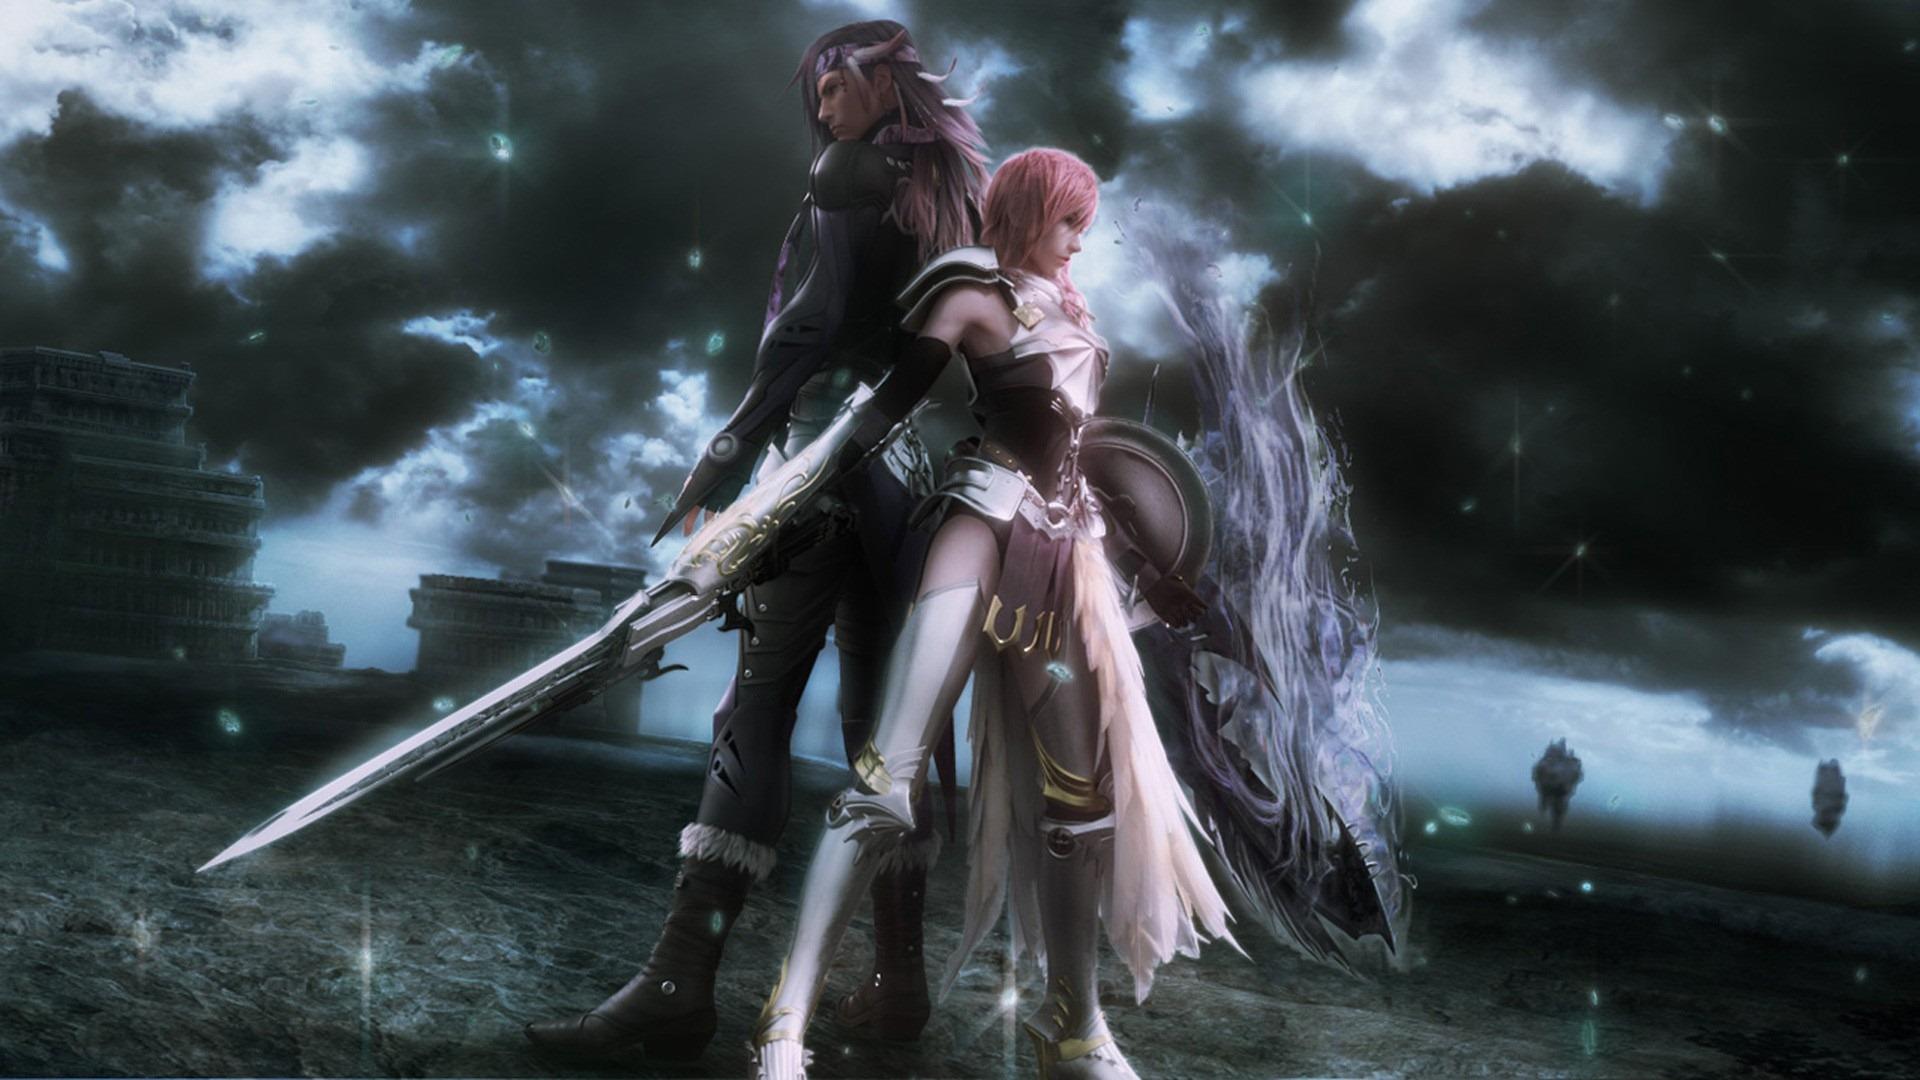 Download Final Fantasy Xiii 2 1920 X 1080 Hd Wallpaper 1920x1080